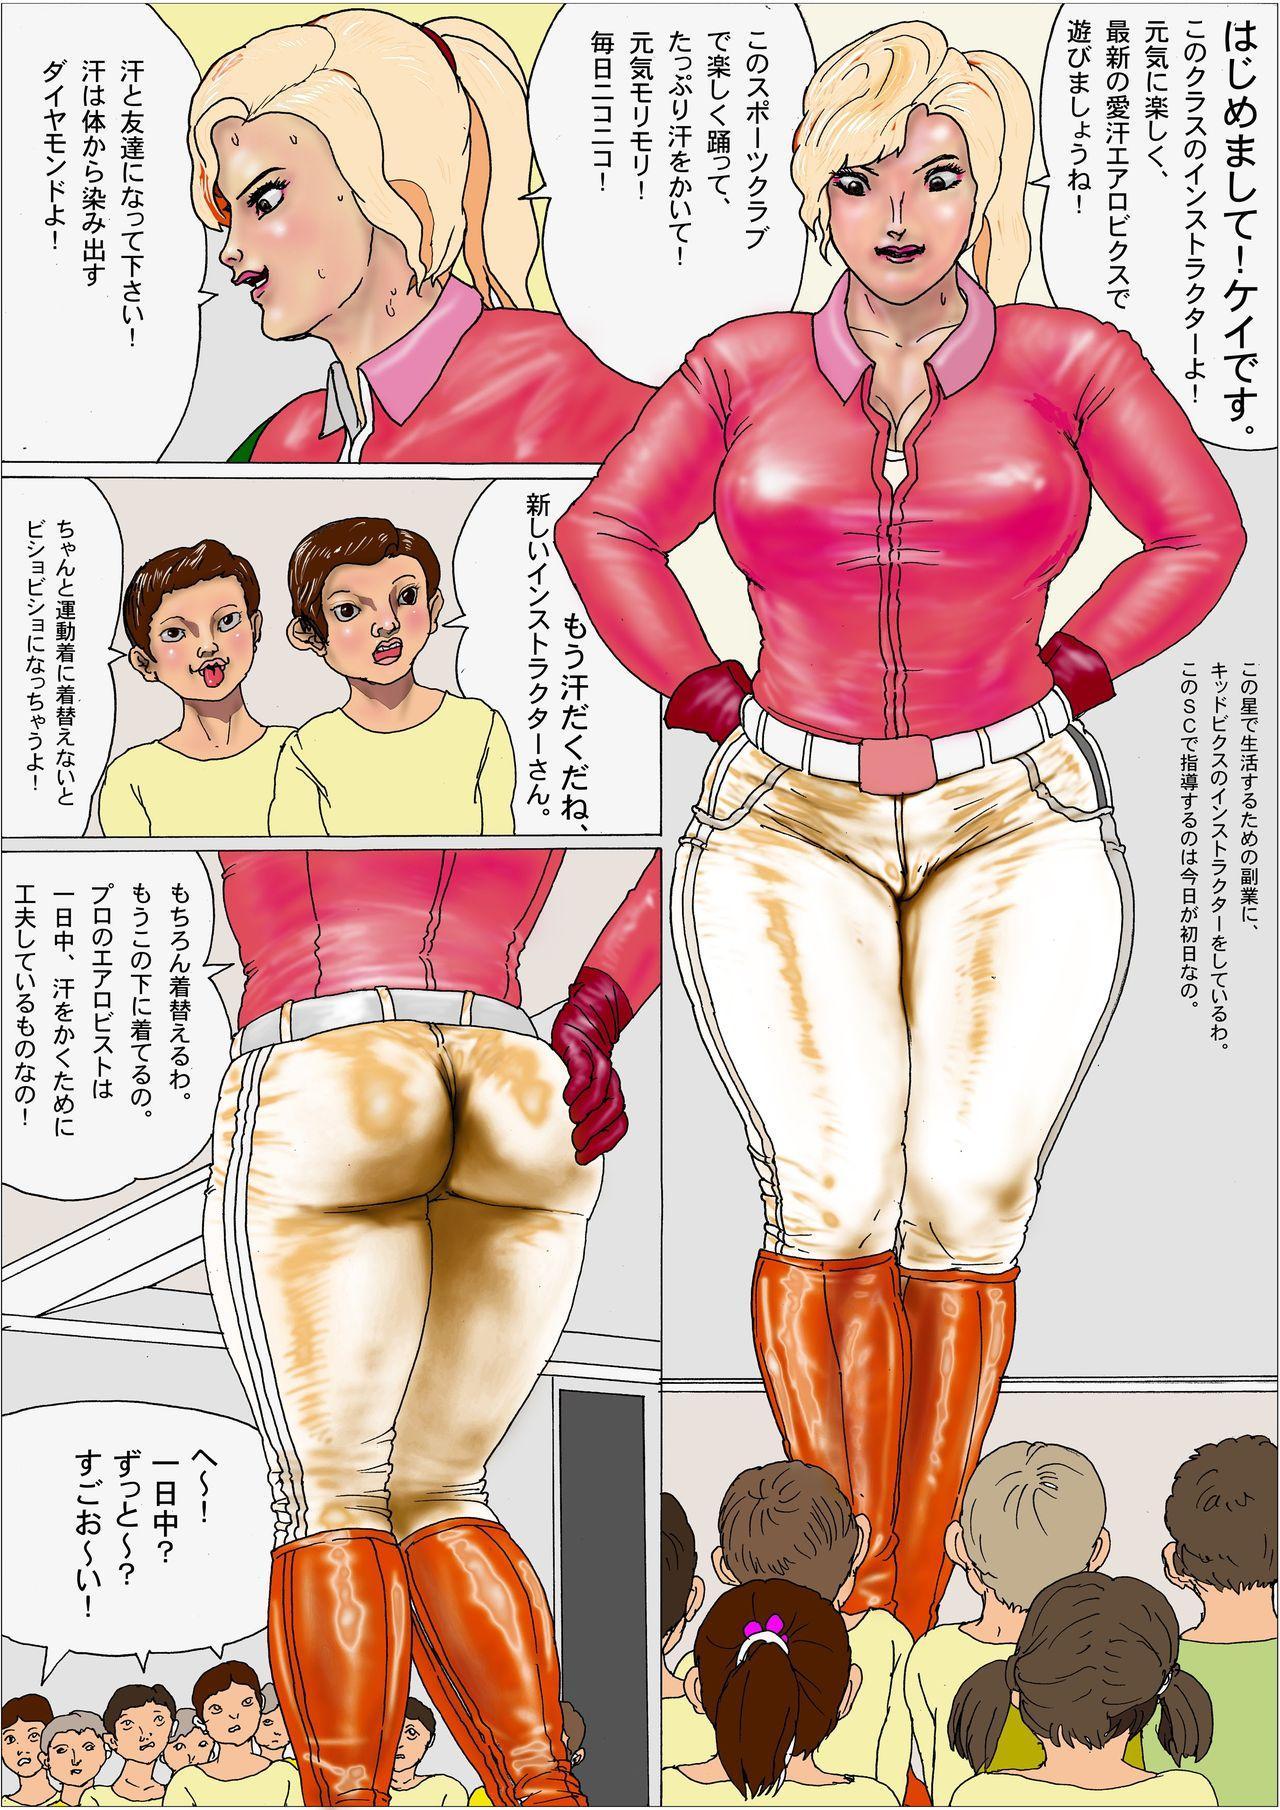 Kyosei kara Kita Aerobi Instructor K - Aerobics Instructor K came from a huge star 49